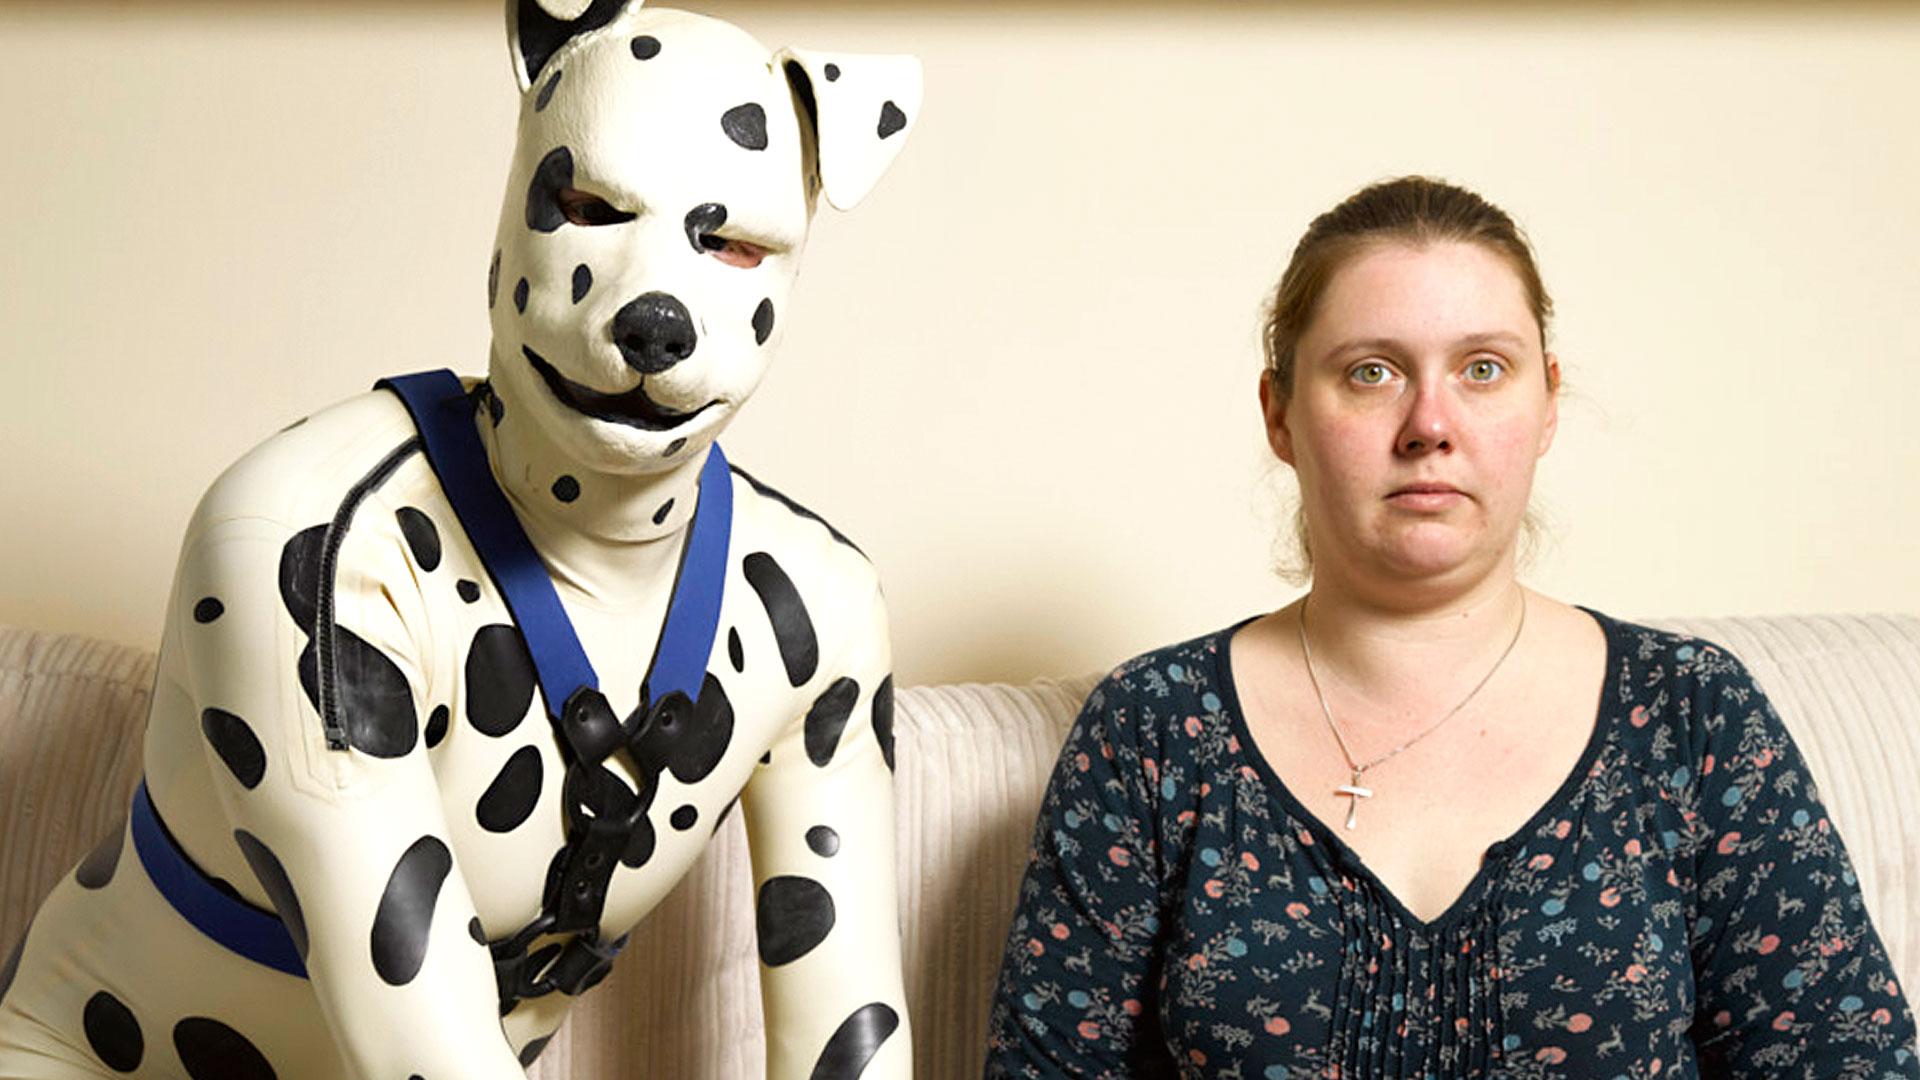 Secret life of human pups full documentary